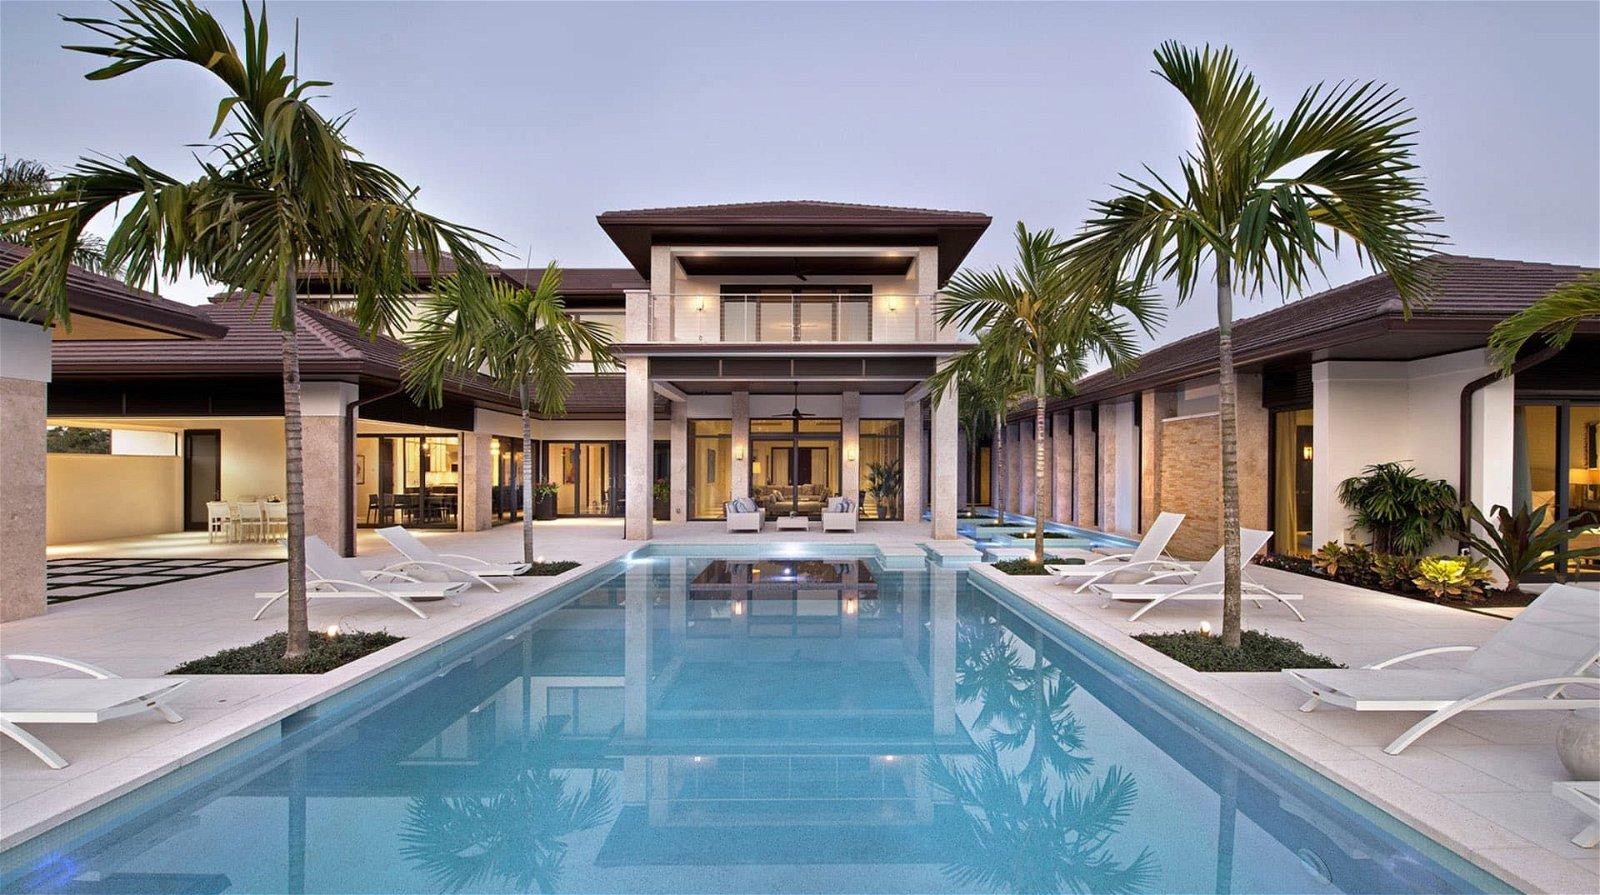 Key West Mortgage, Mortgage for Key West, Key West Mortgage; Key West Conforming Mortgage, Key West Conforming Mortgage